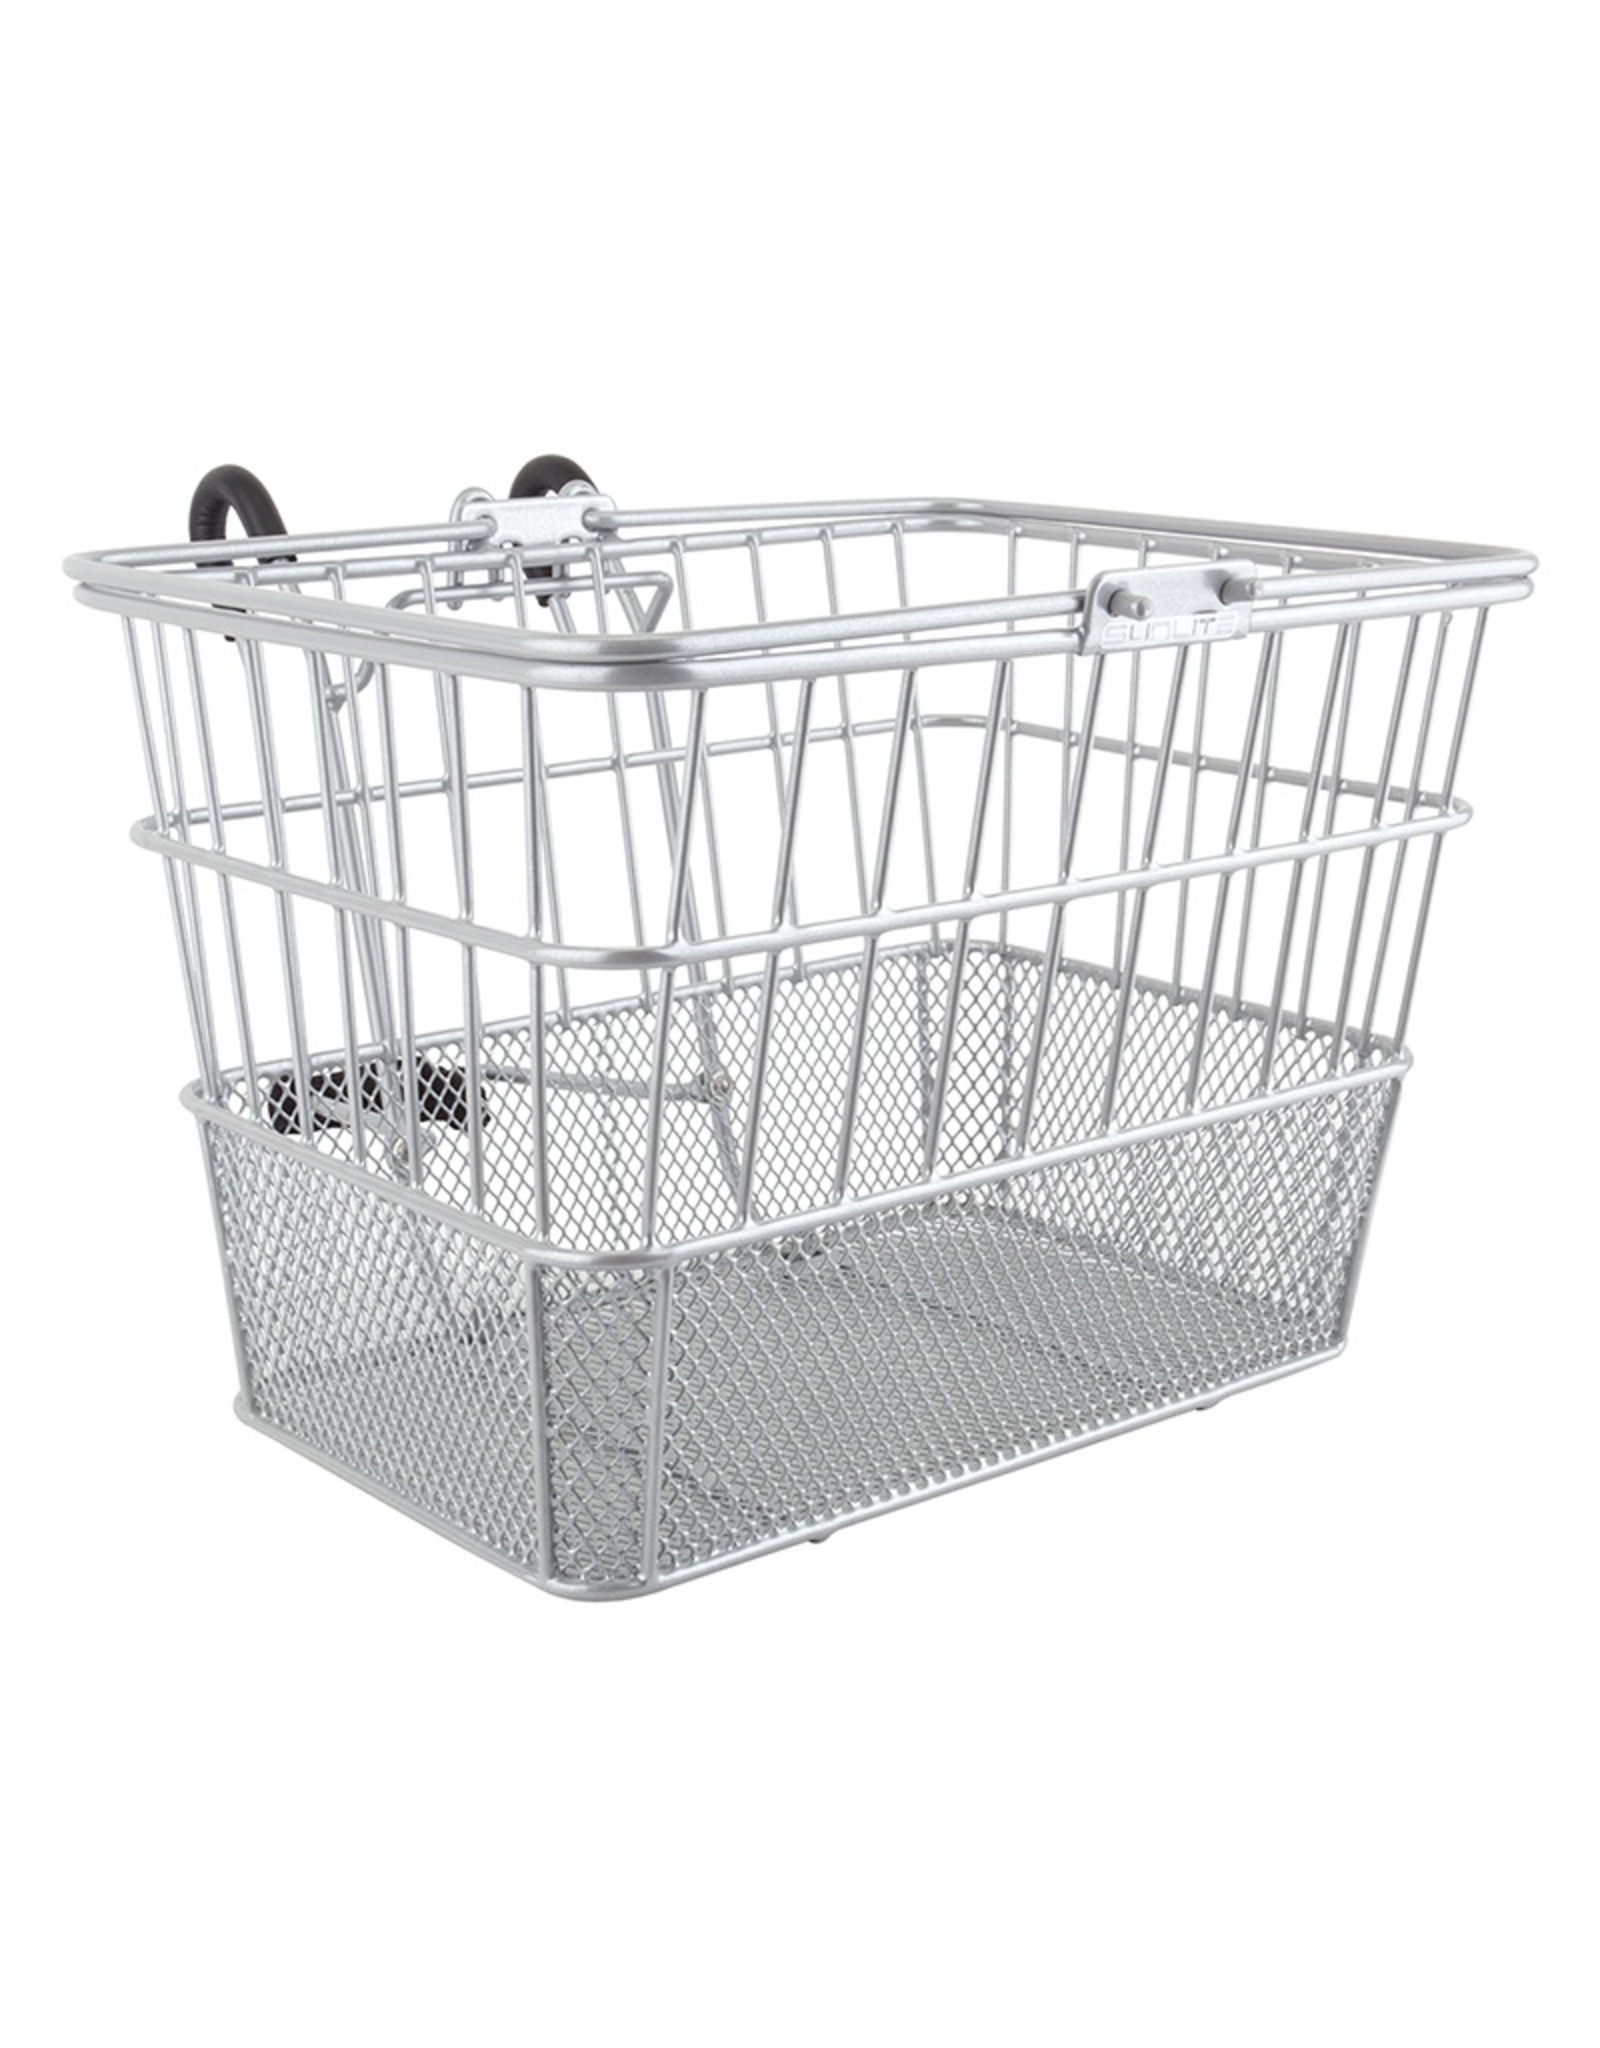 Sunlite Sunlite/Ultracycle Front Basket - Mesh Bottom Lift-Off, Silver